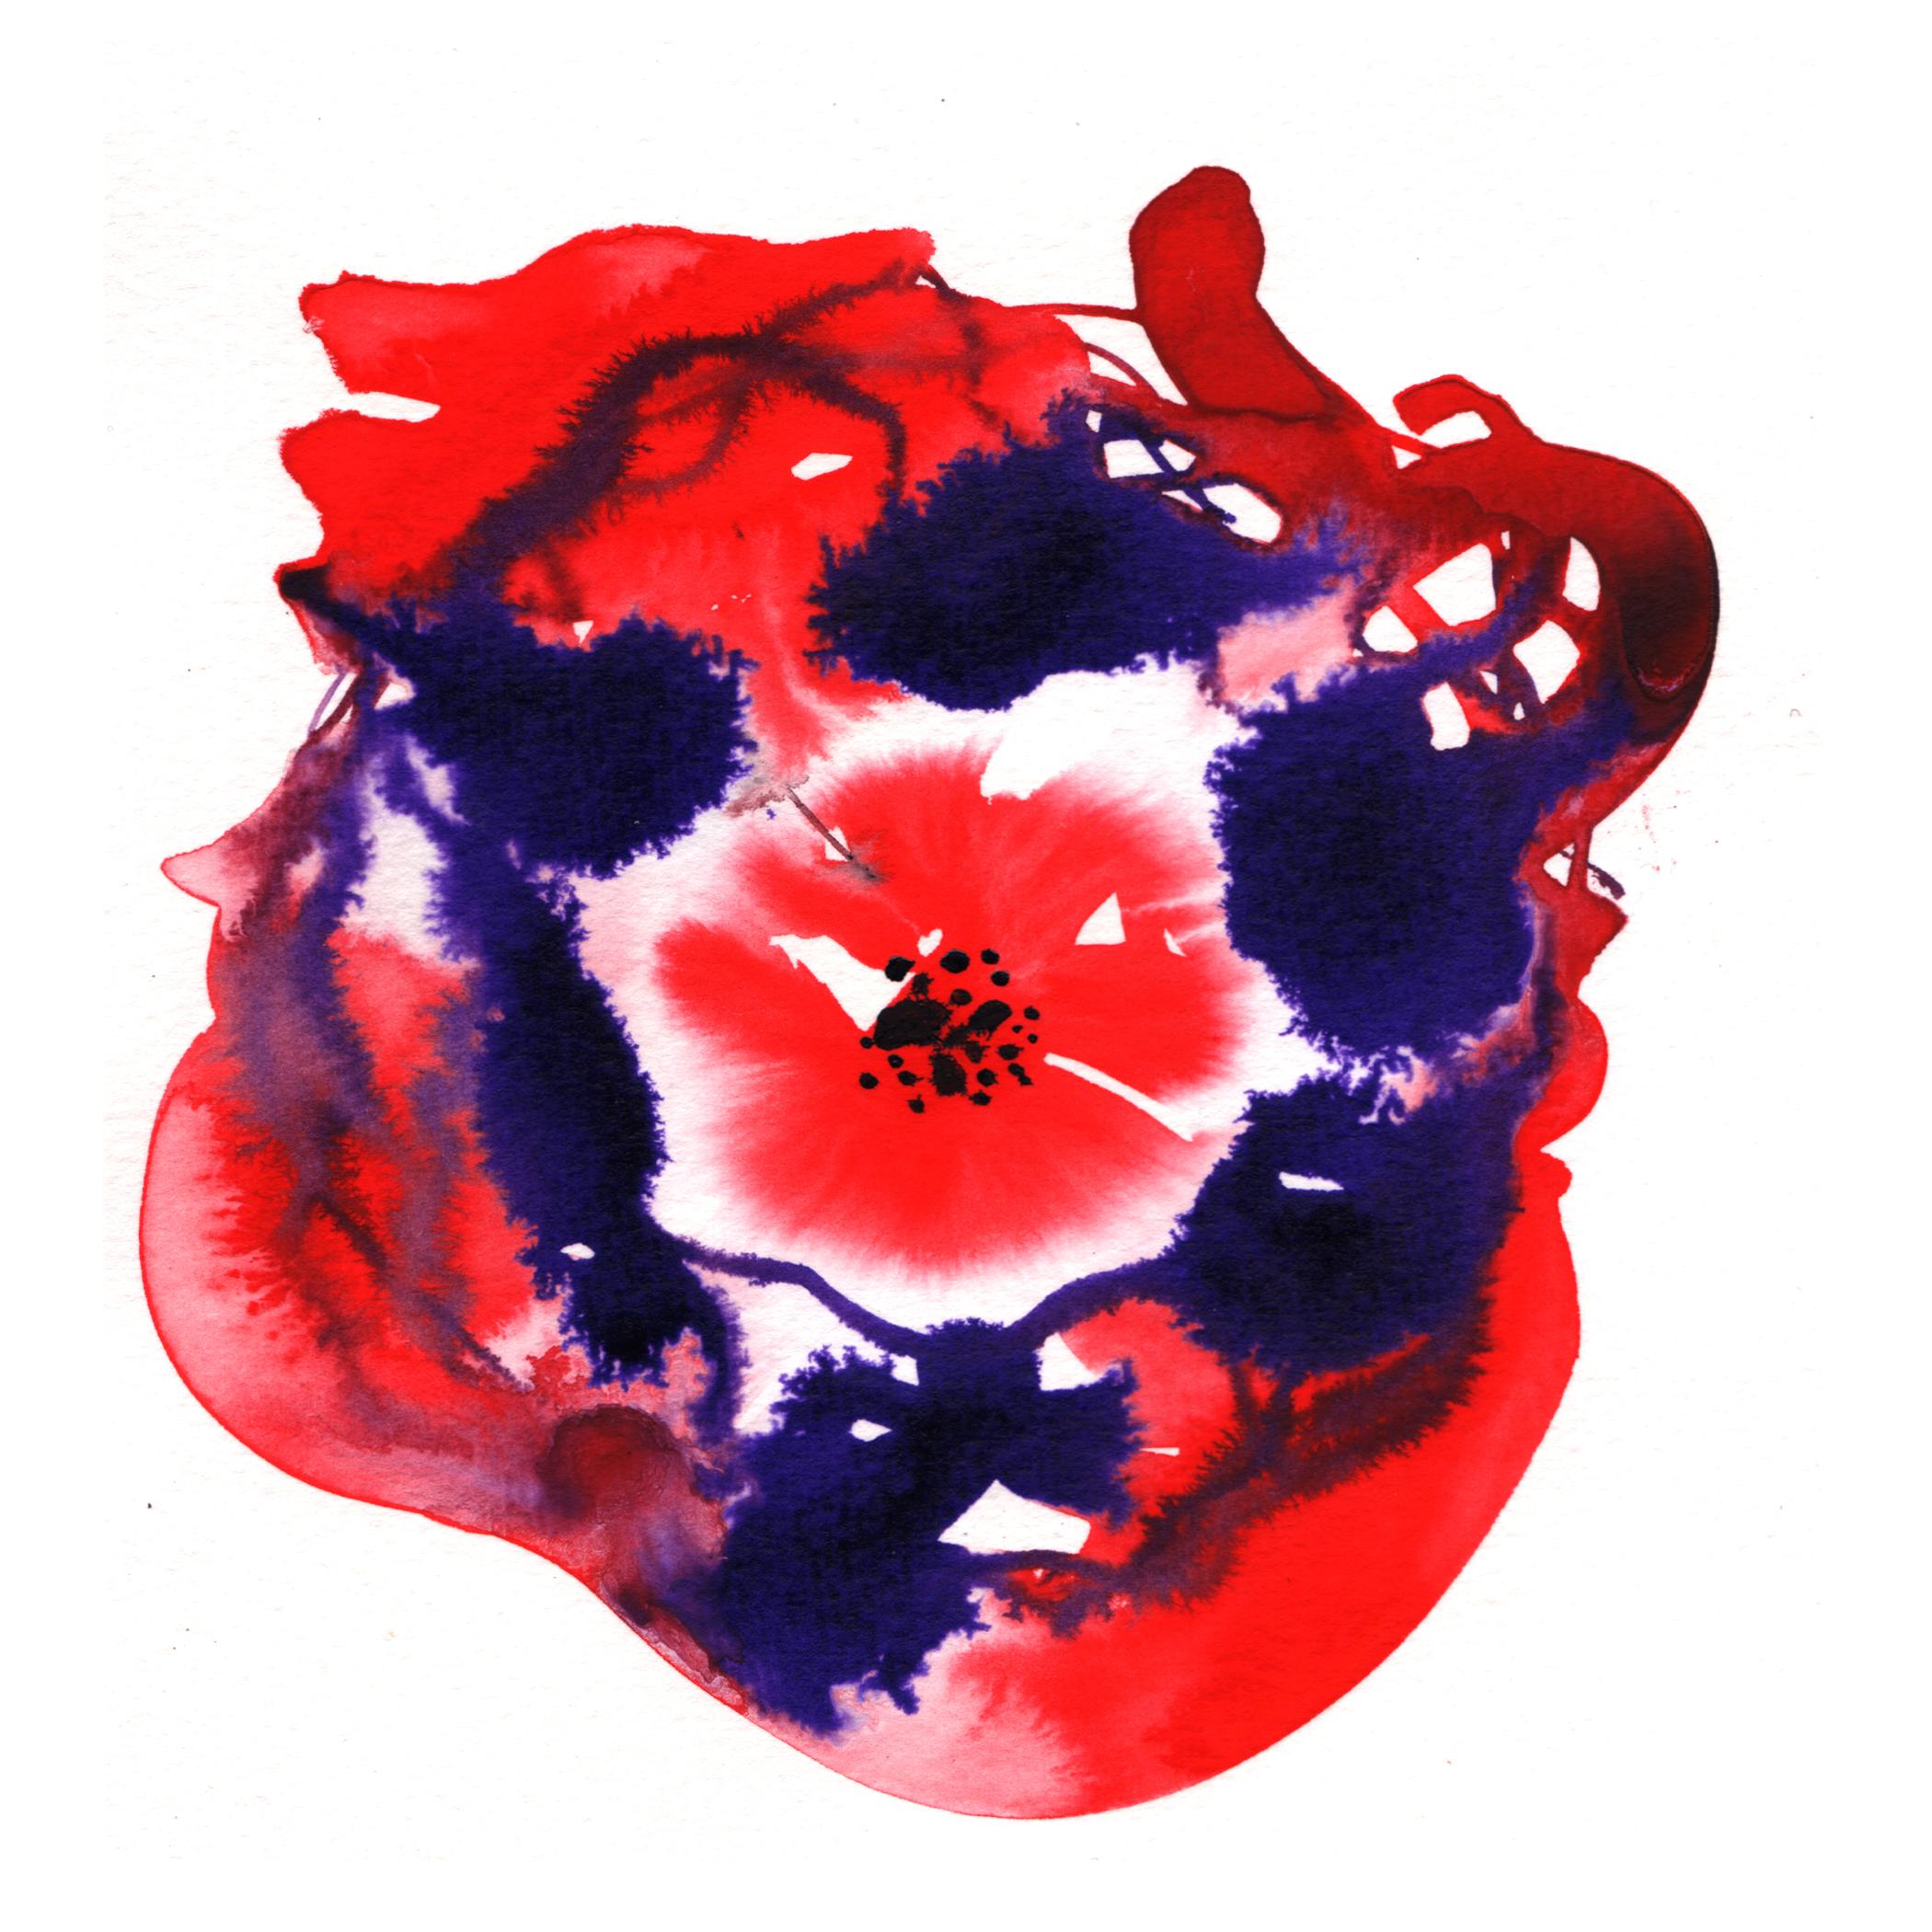 26.Hibiscus.3.6.14.jpg